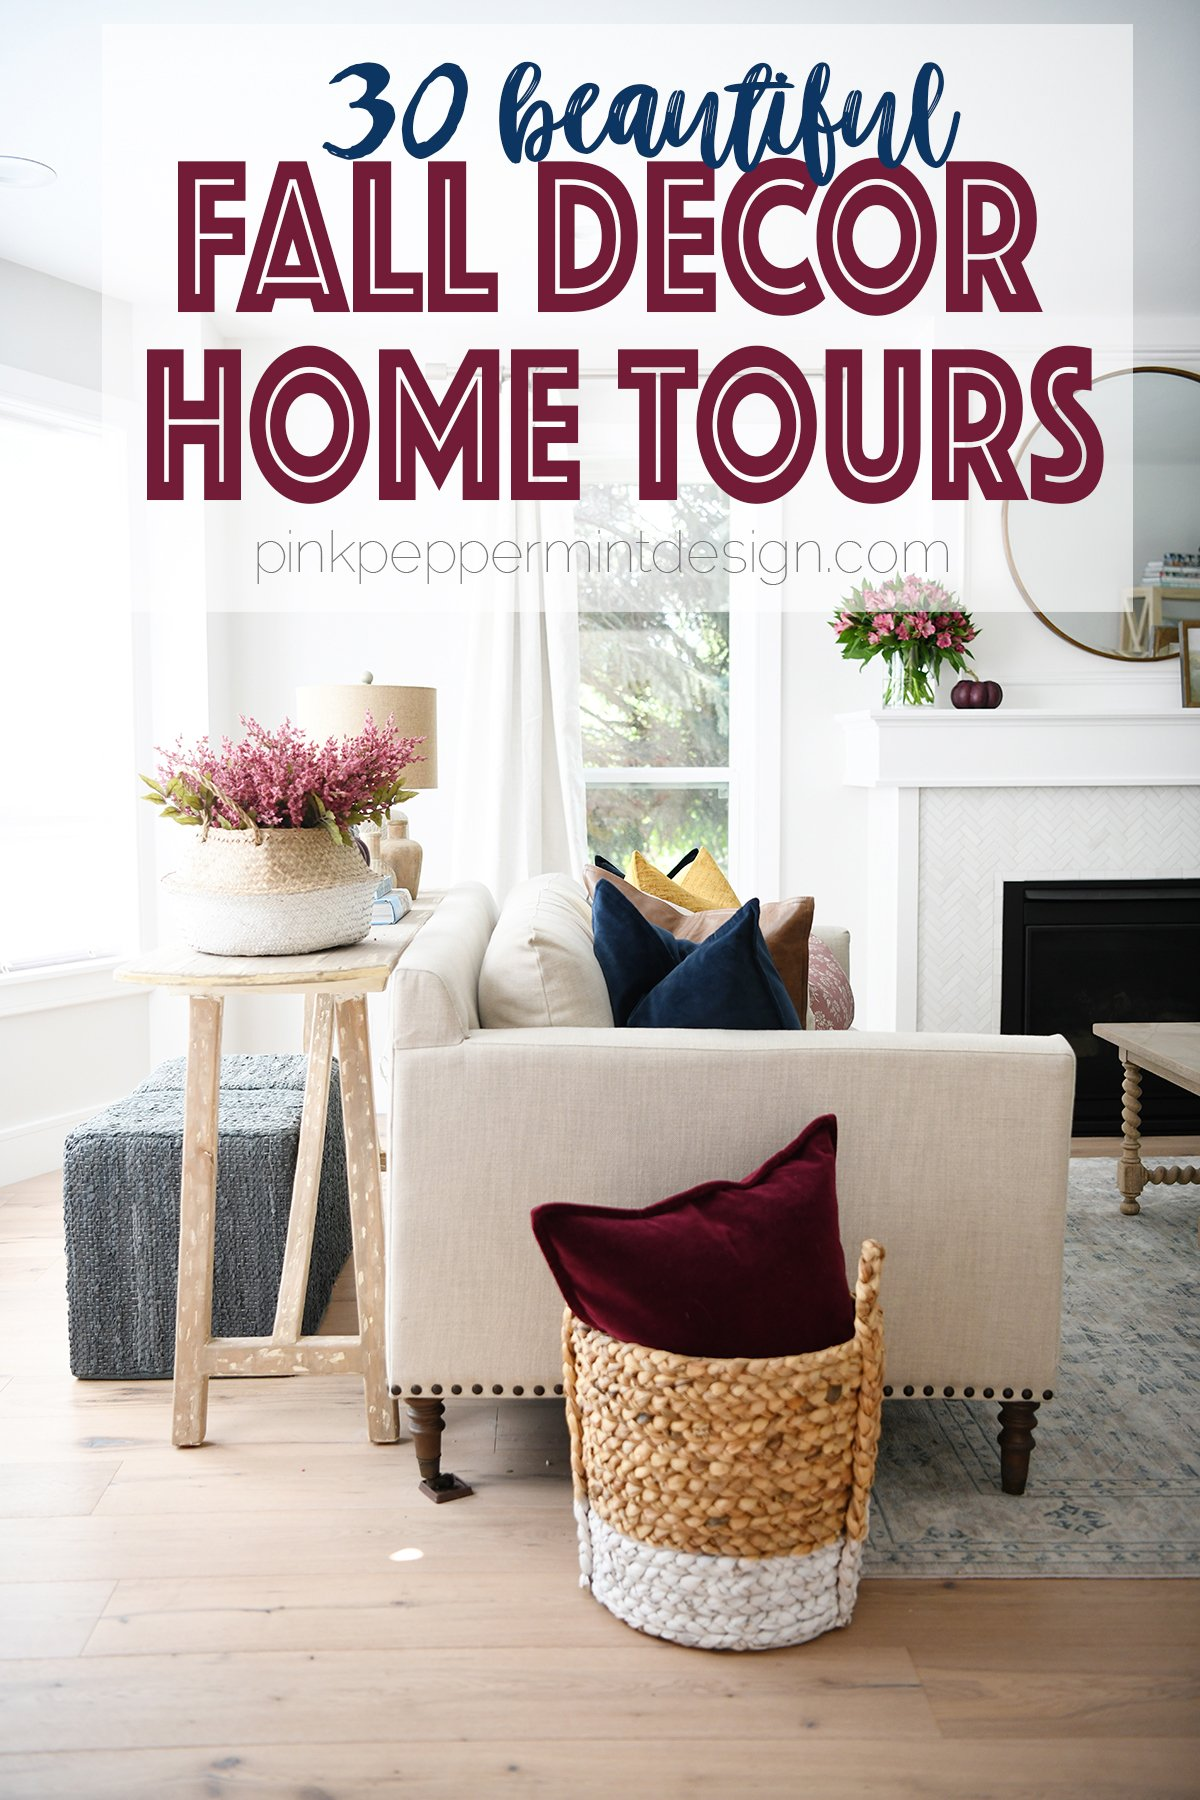 Fall decor home tours